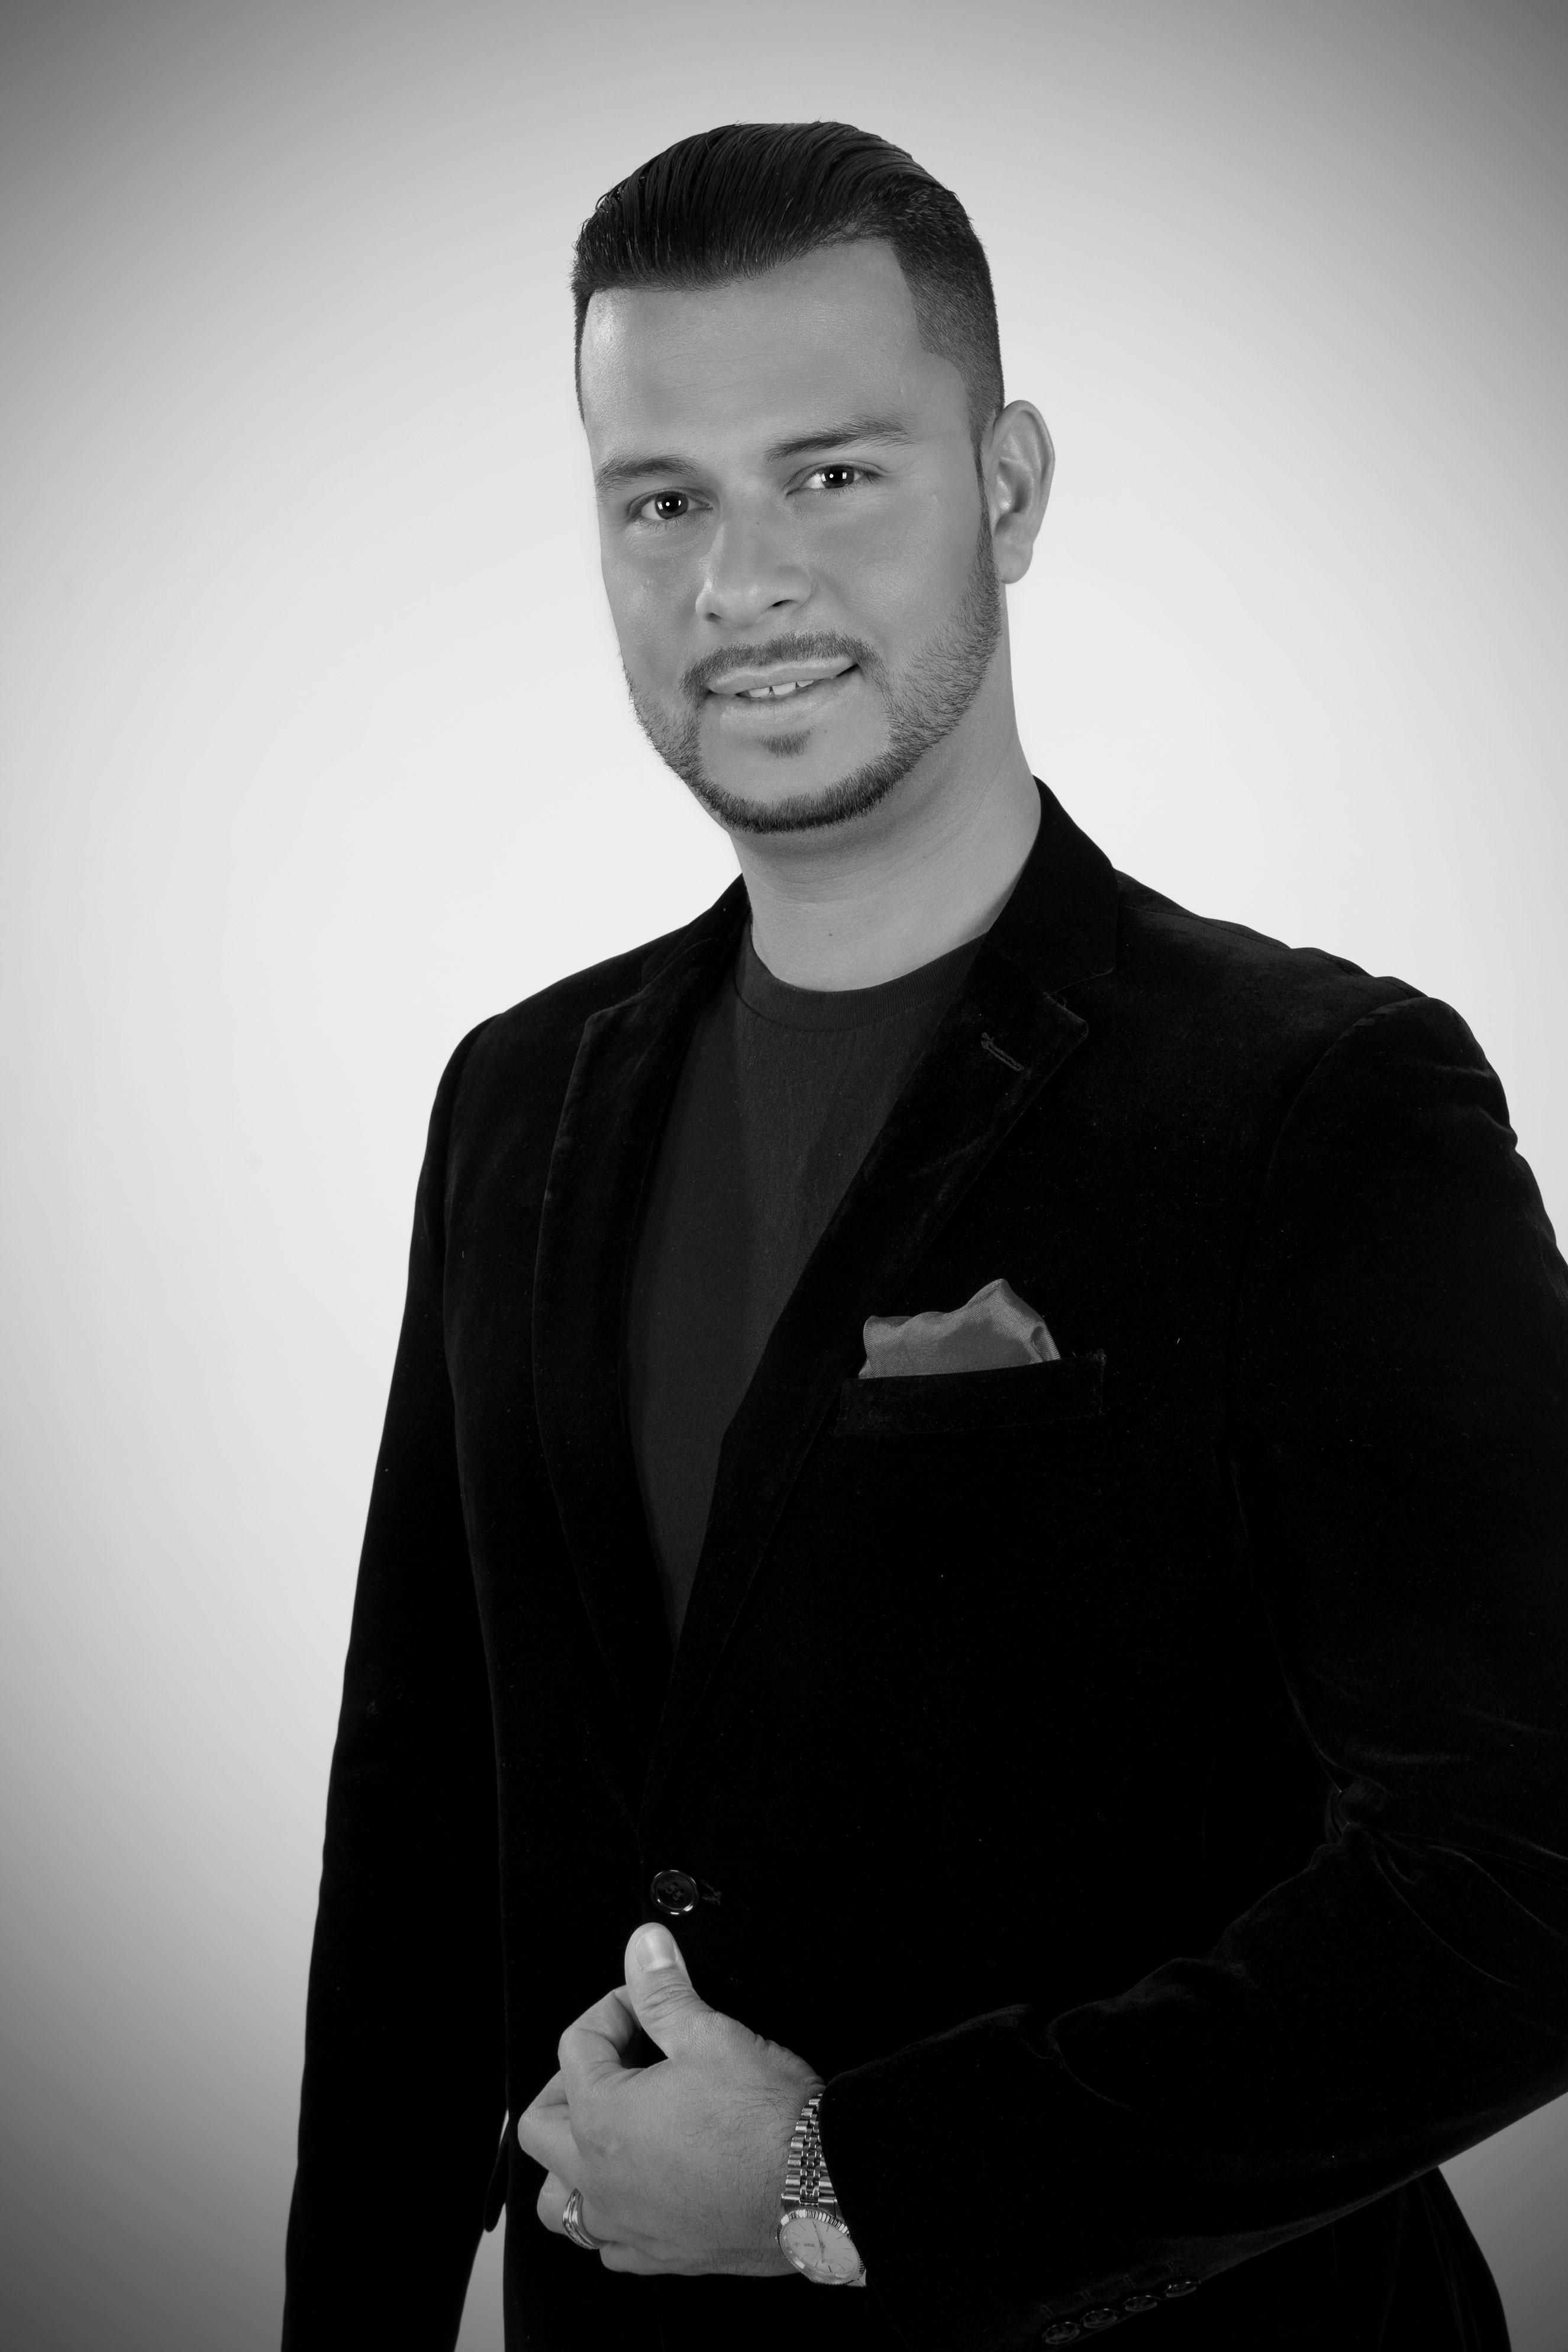 Portrait of Professional Dancer and Instructor Leo Mora